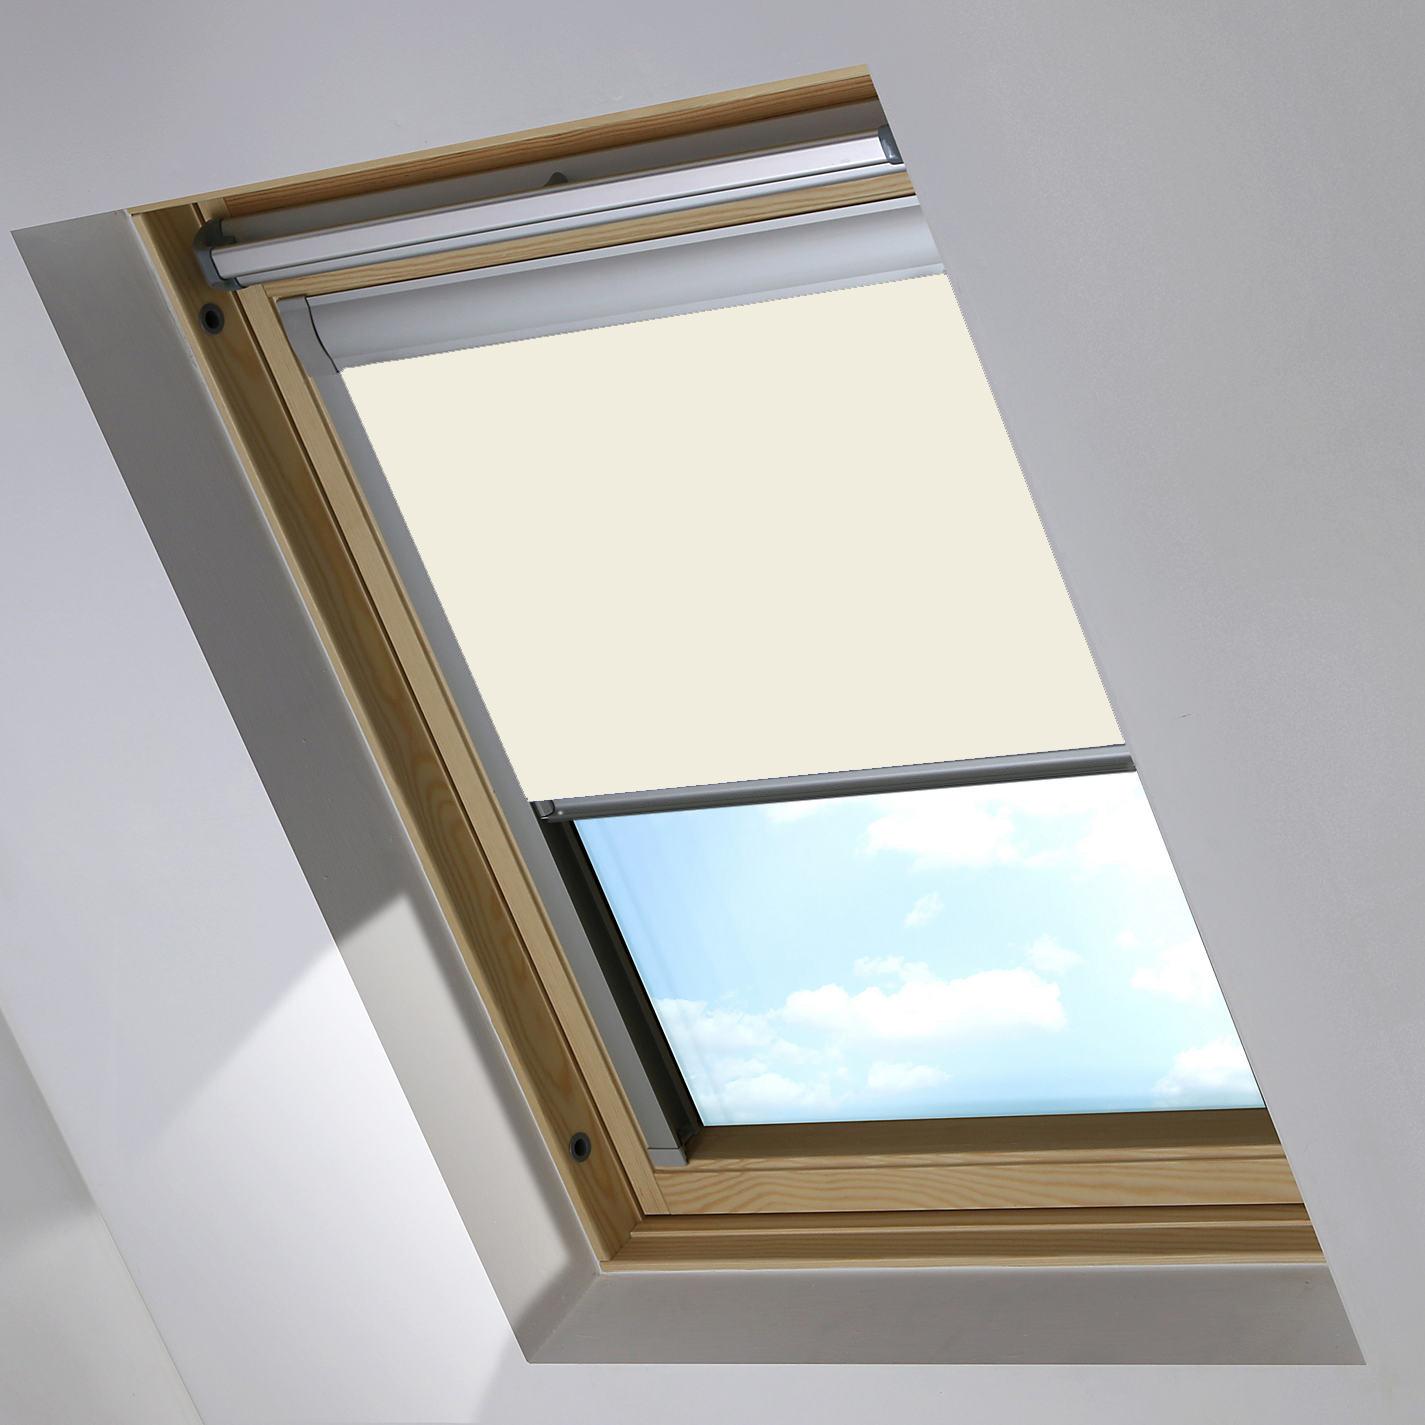 0017-002 Bog Cotton Skylight blind partially open